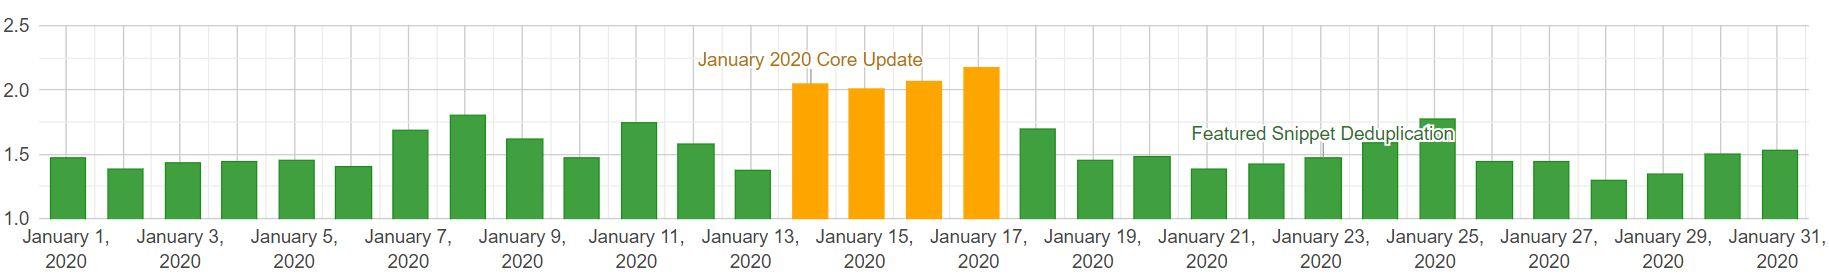 SERP changes desktop styczeń 2020